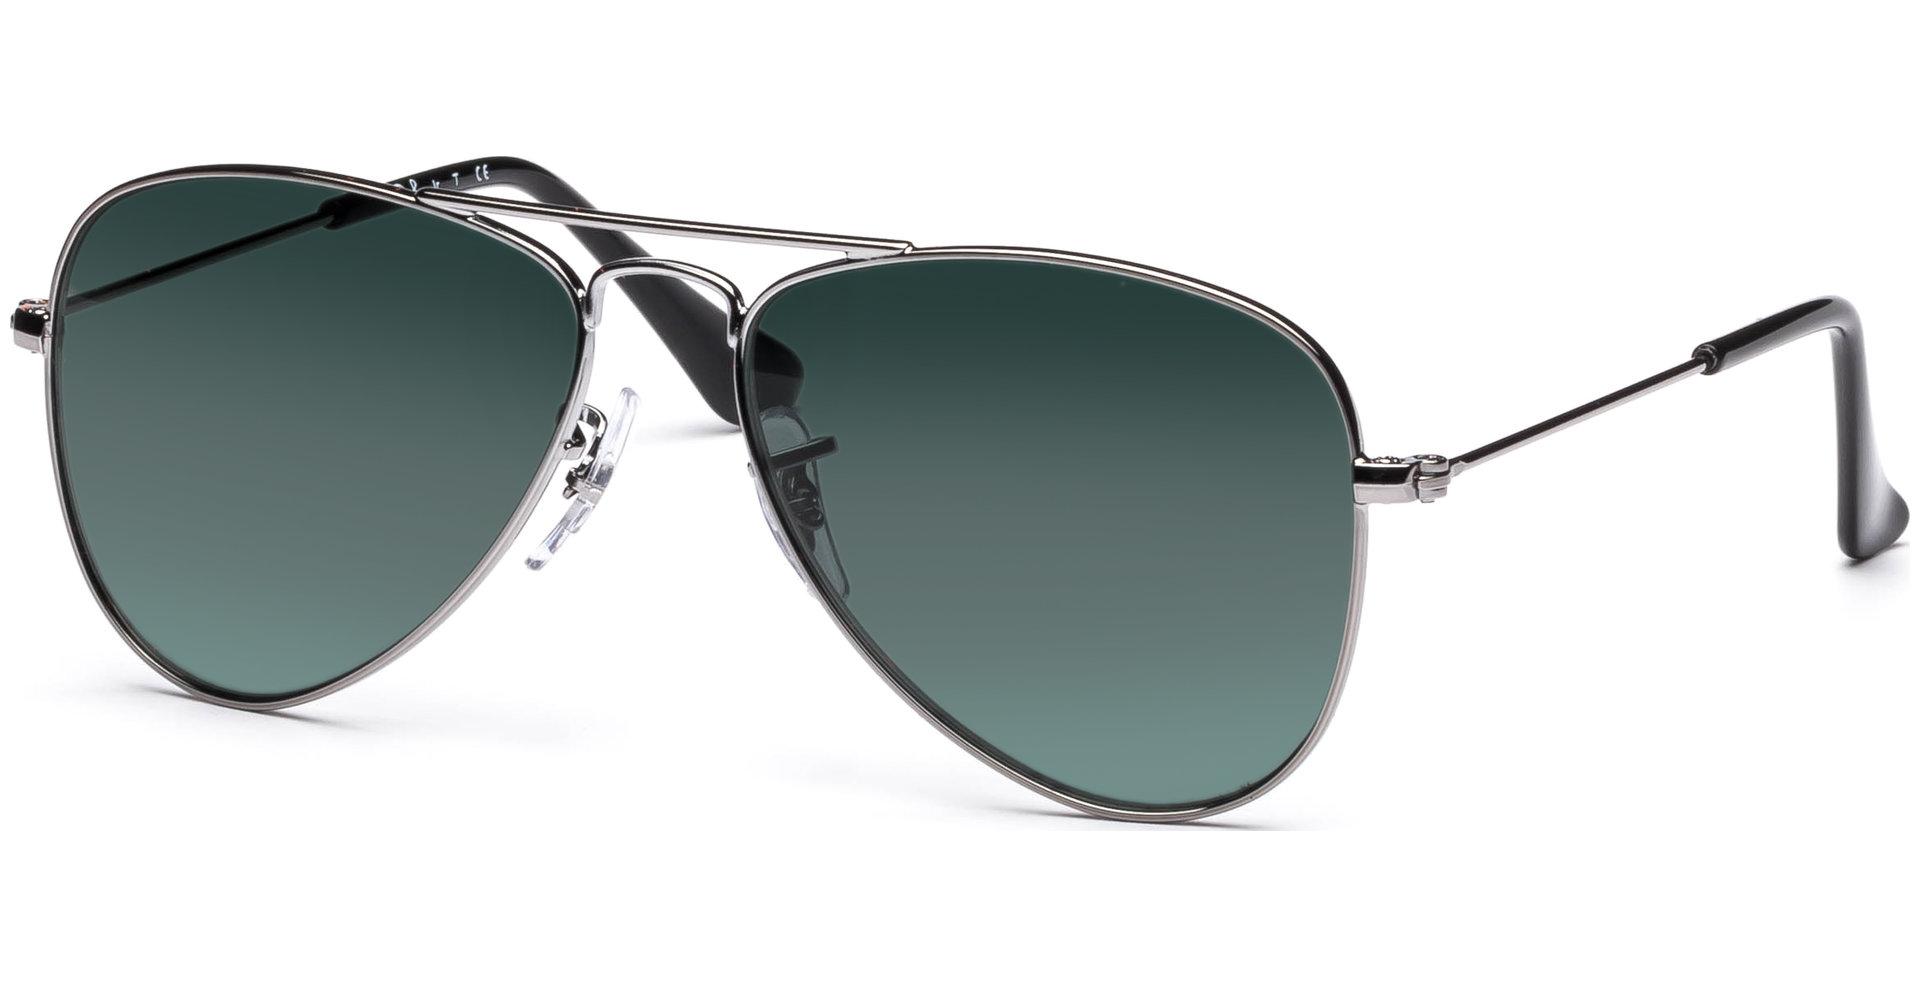 ray ban junior 9506s 200 71 5013 gunmetal green von. Black Bedroom Furniture Sets. Home Design Ideas